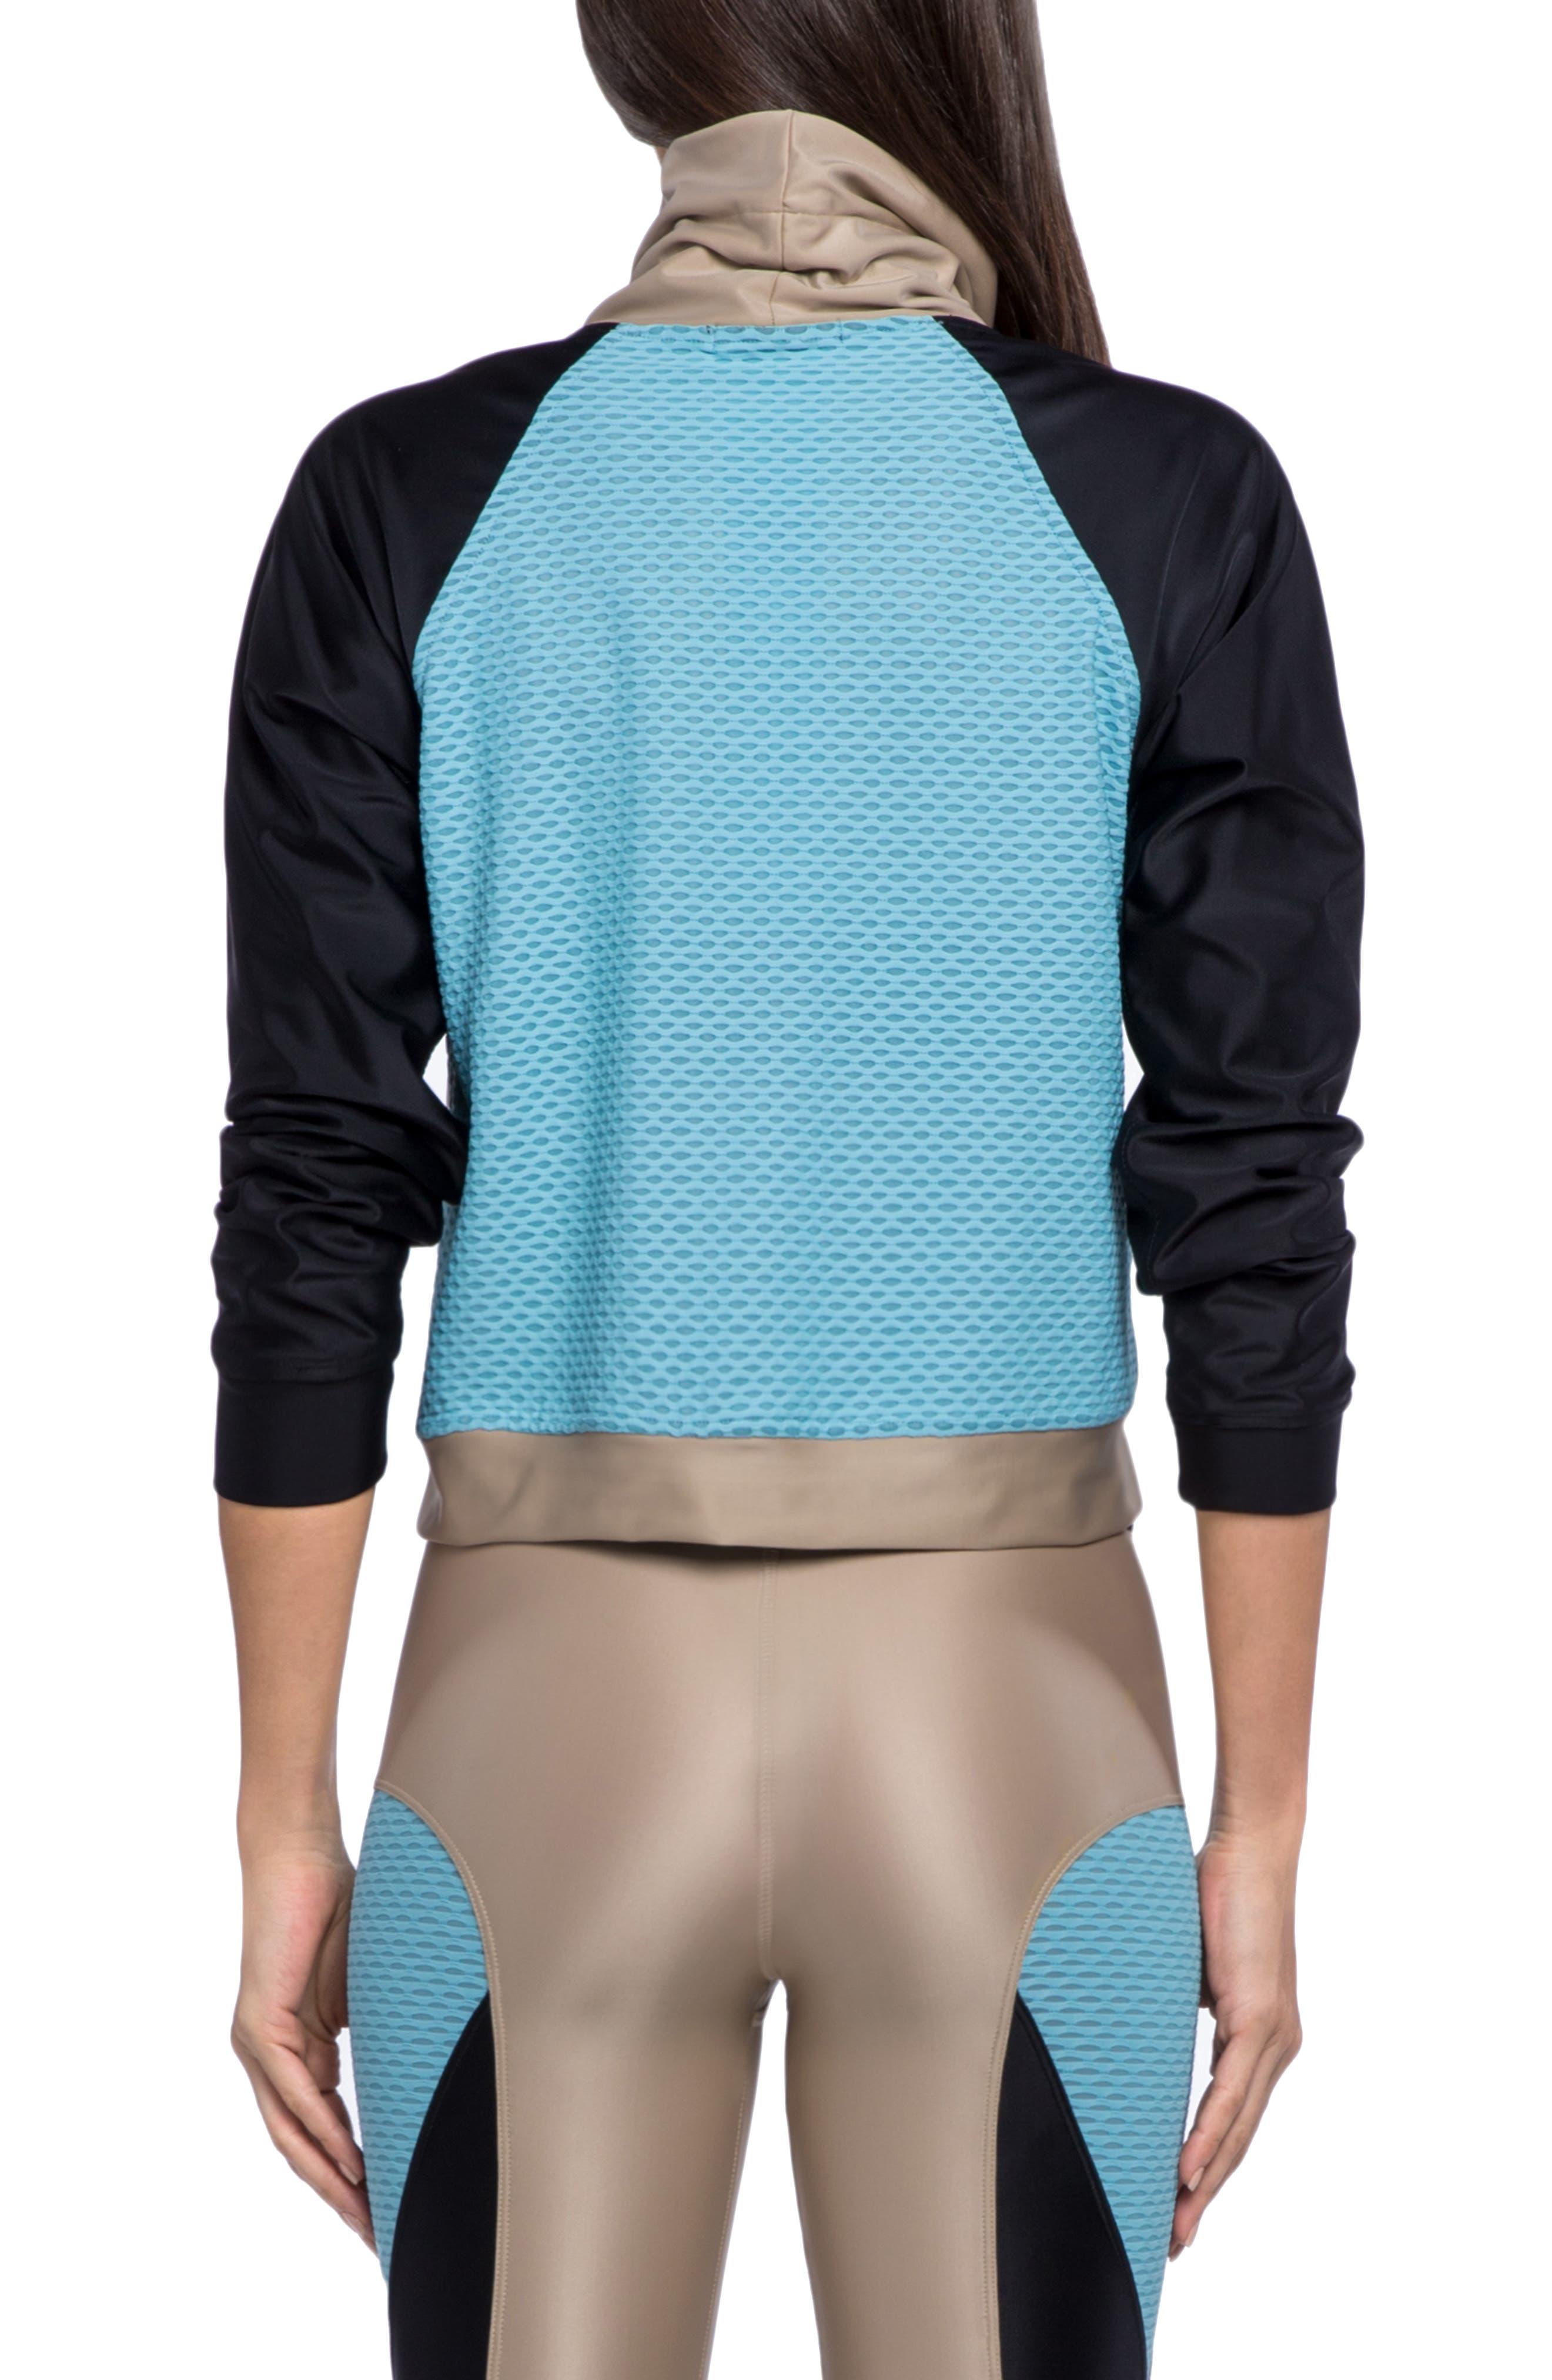 Pump Energy Sweatshirt,                             Alternate thumbnail 2, color,                             HUMMUS/ BLACK/ MILKYBLUE